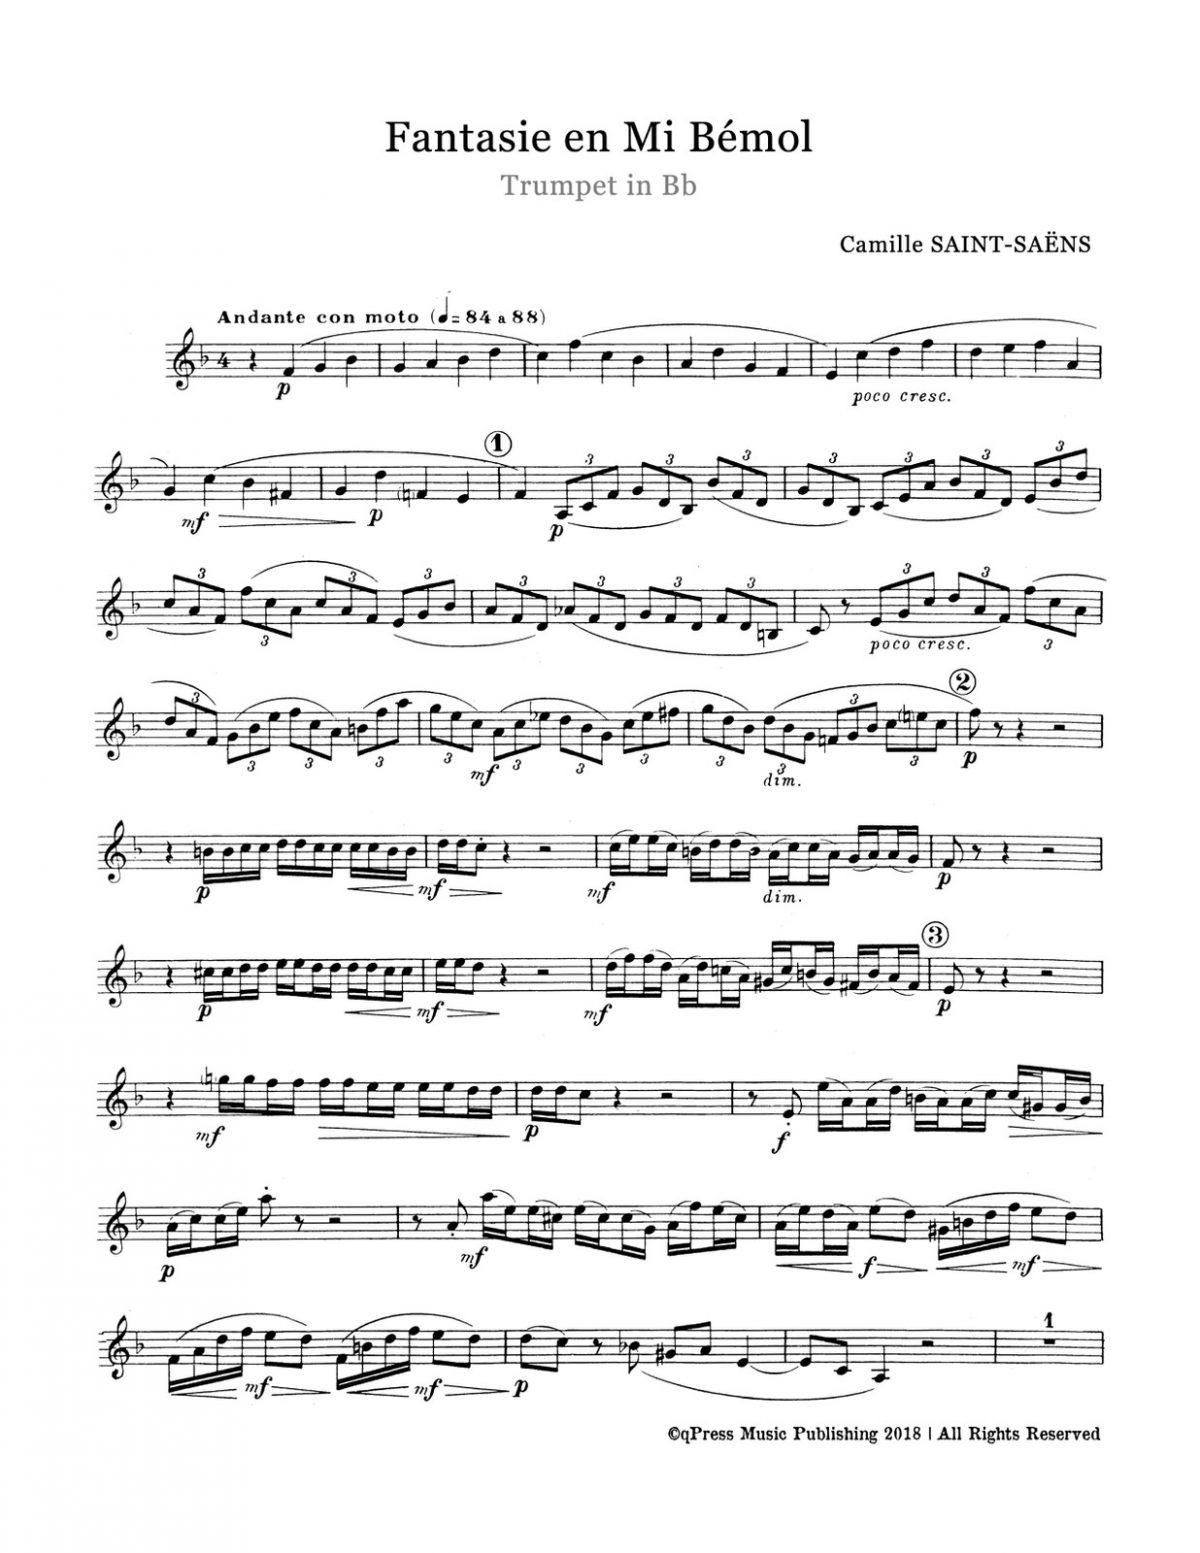 Saint-Saens, Fantasy in Eb Major-p03